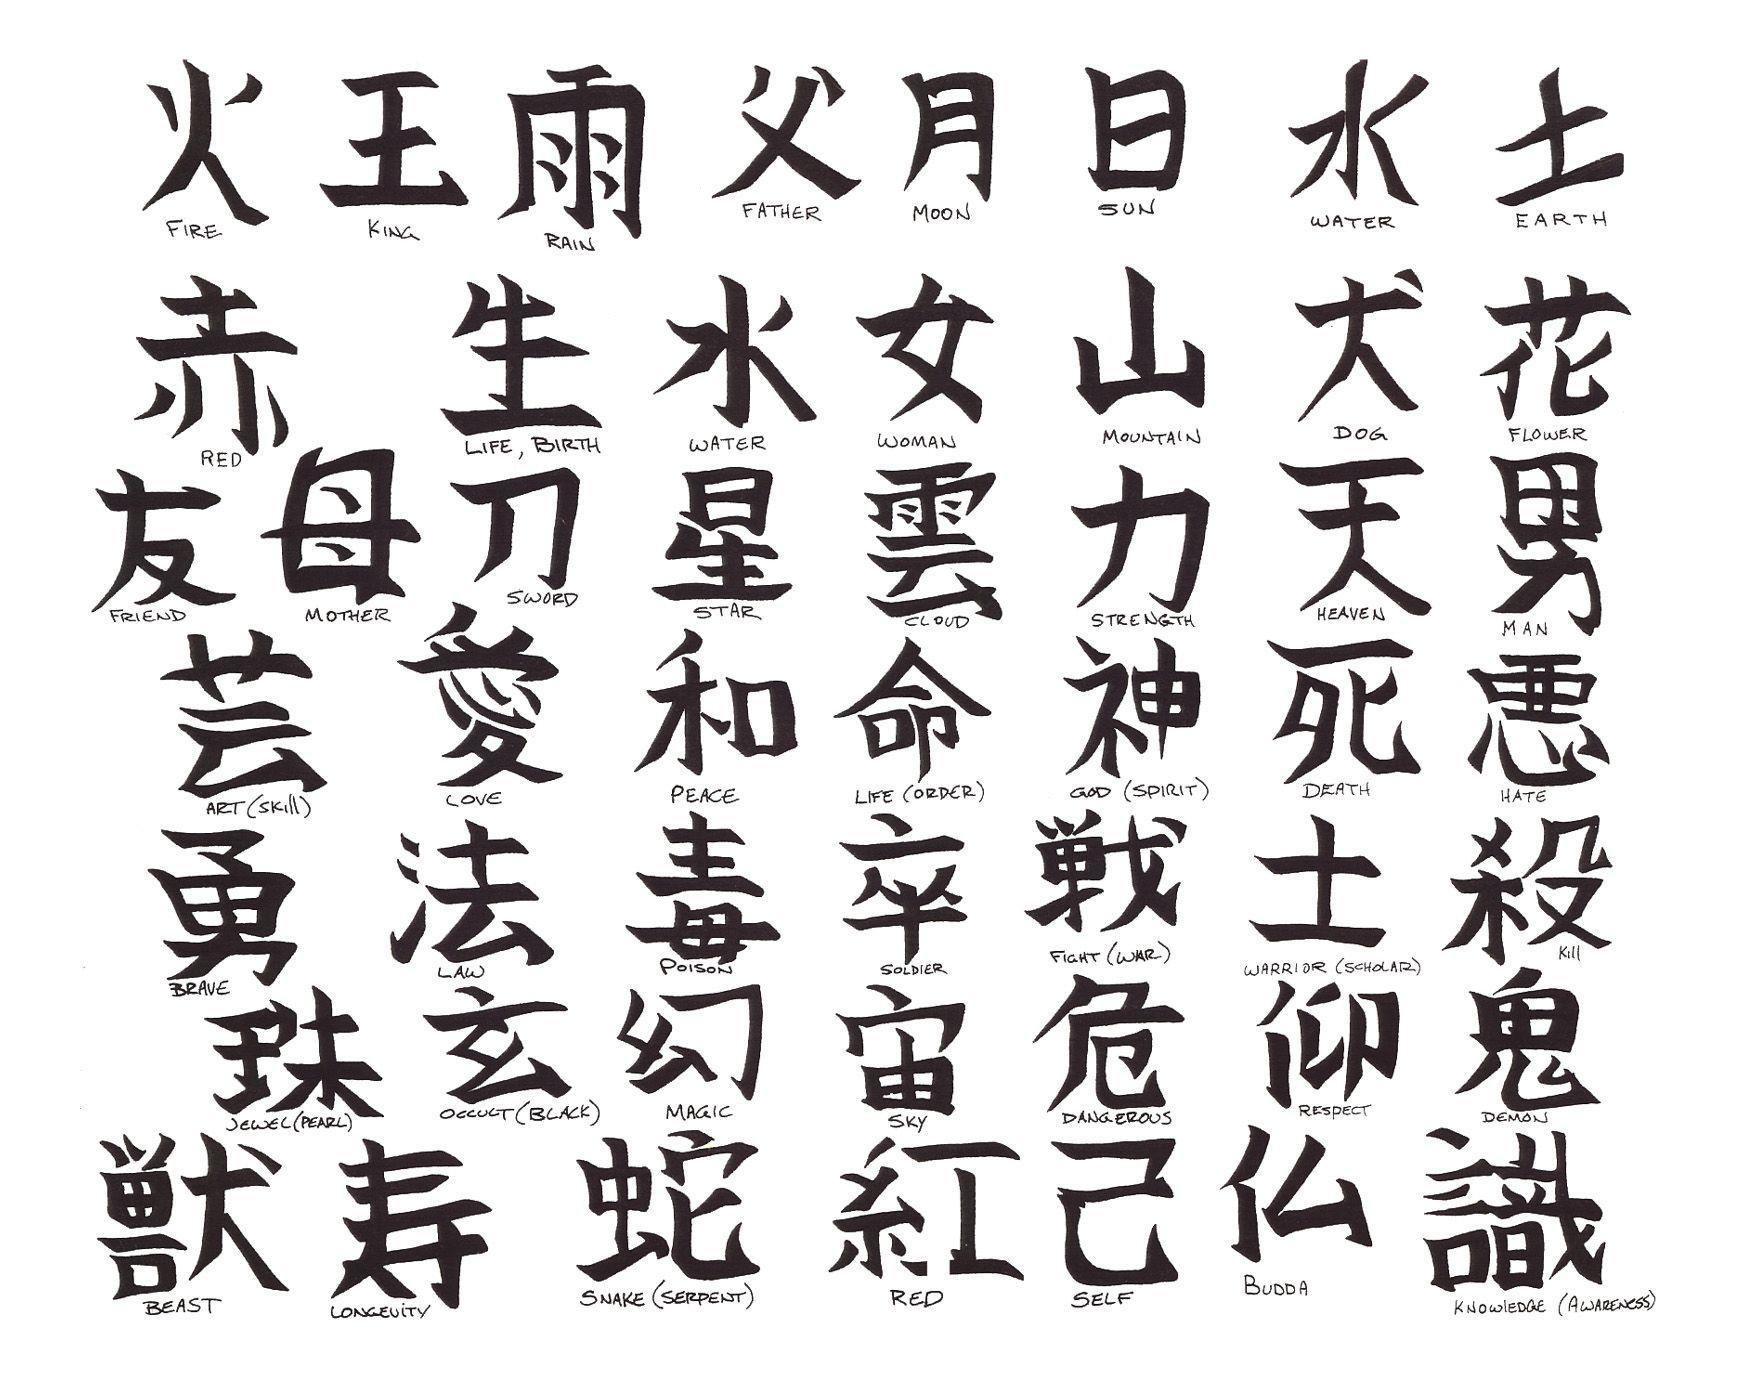 tattoo symbols amp design index alphabetical listing of - HD1750×1375